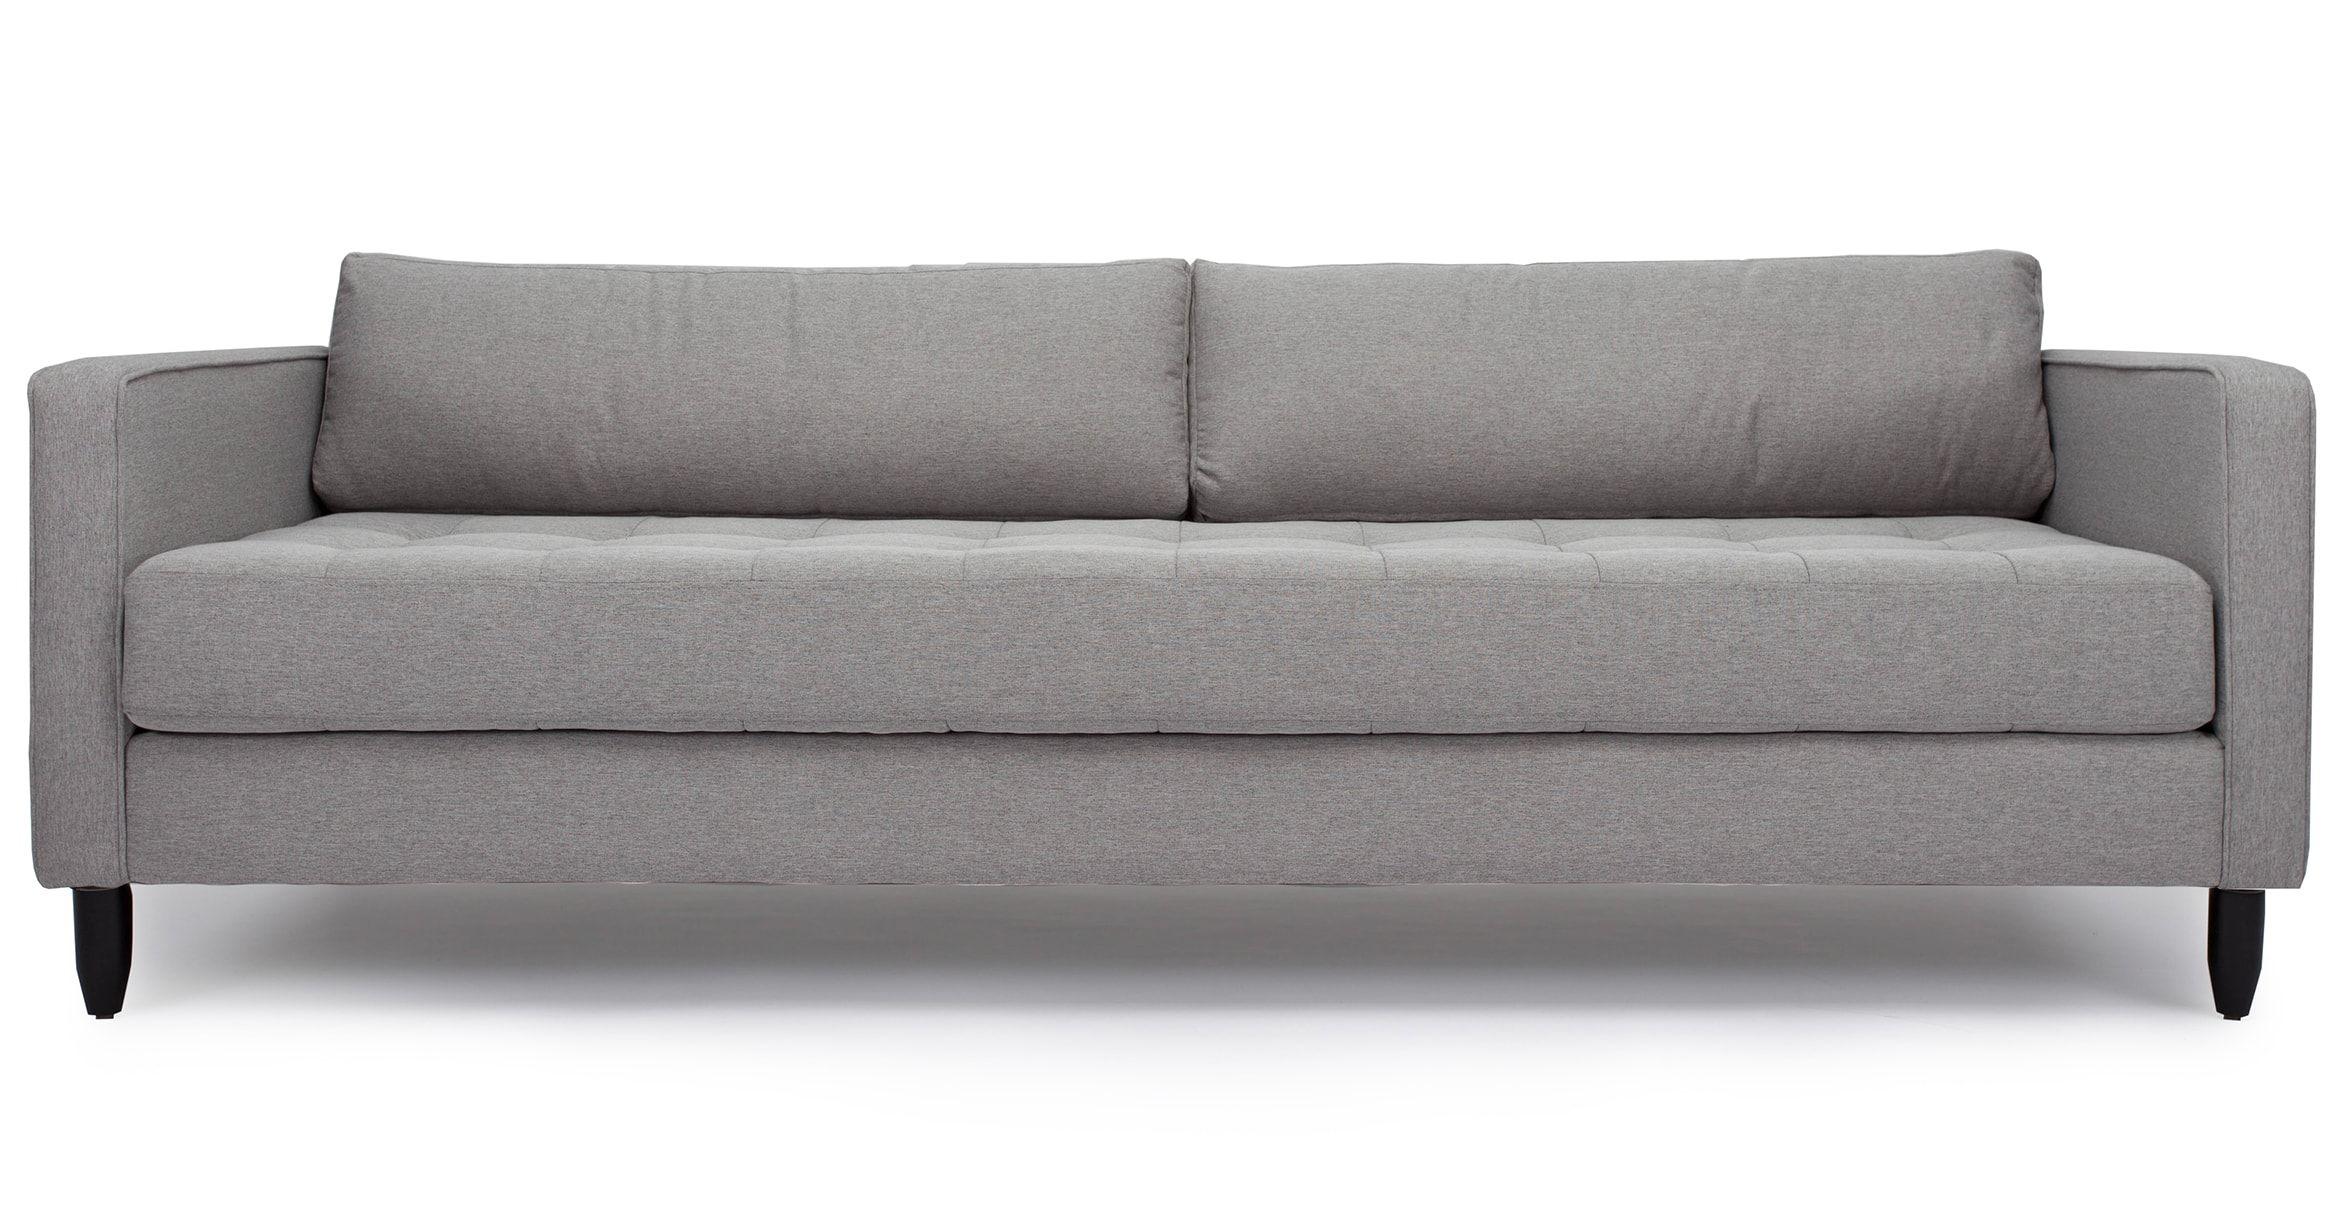 Mid Century Modern Sofas Louie in Fabric IFN Modern